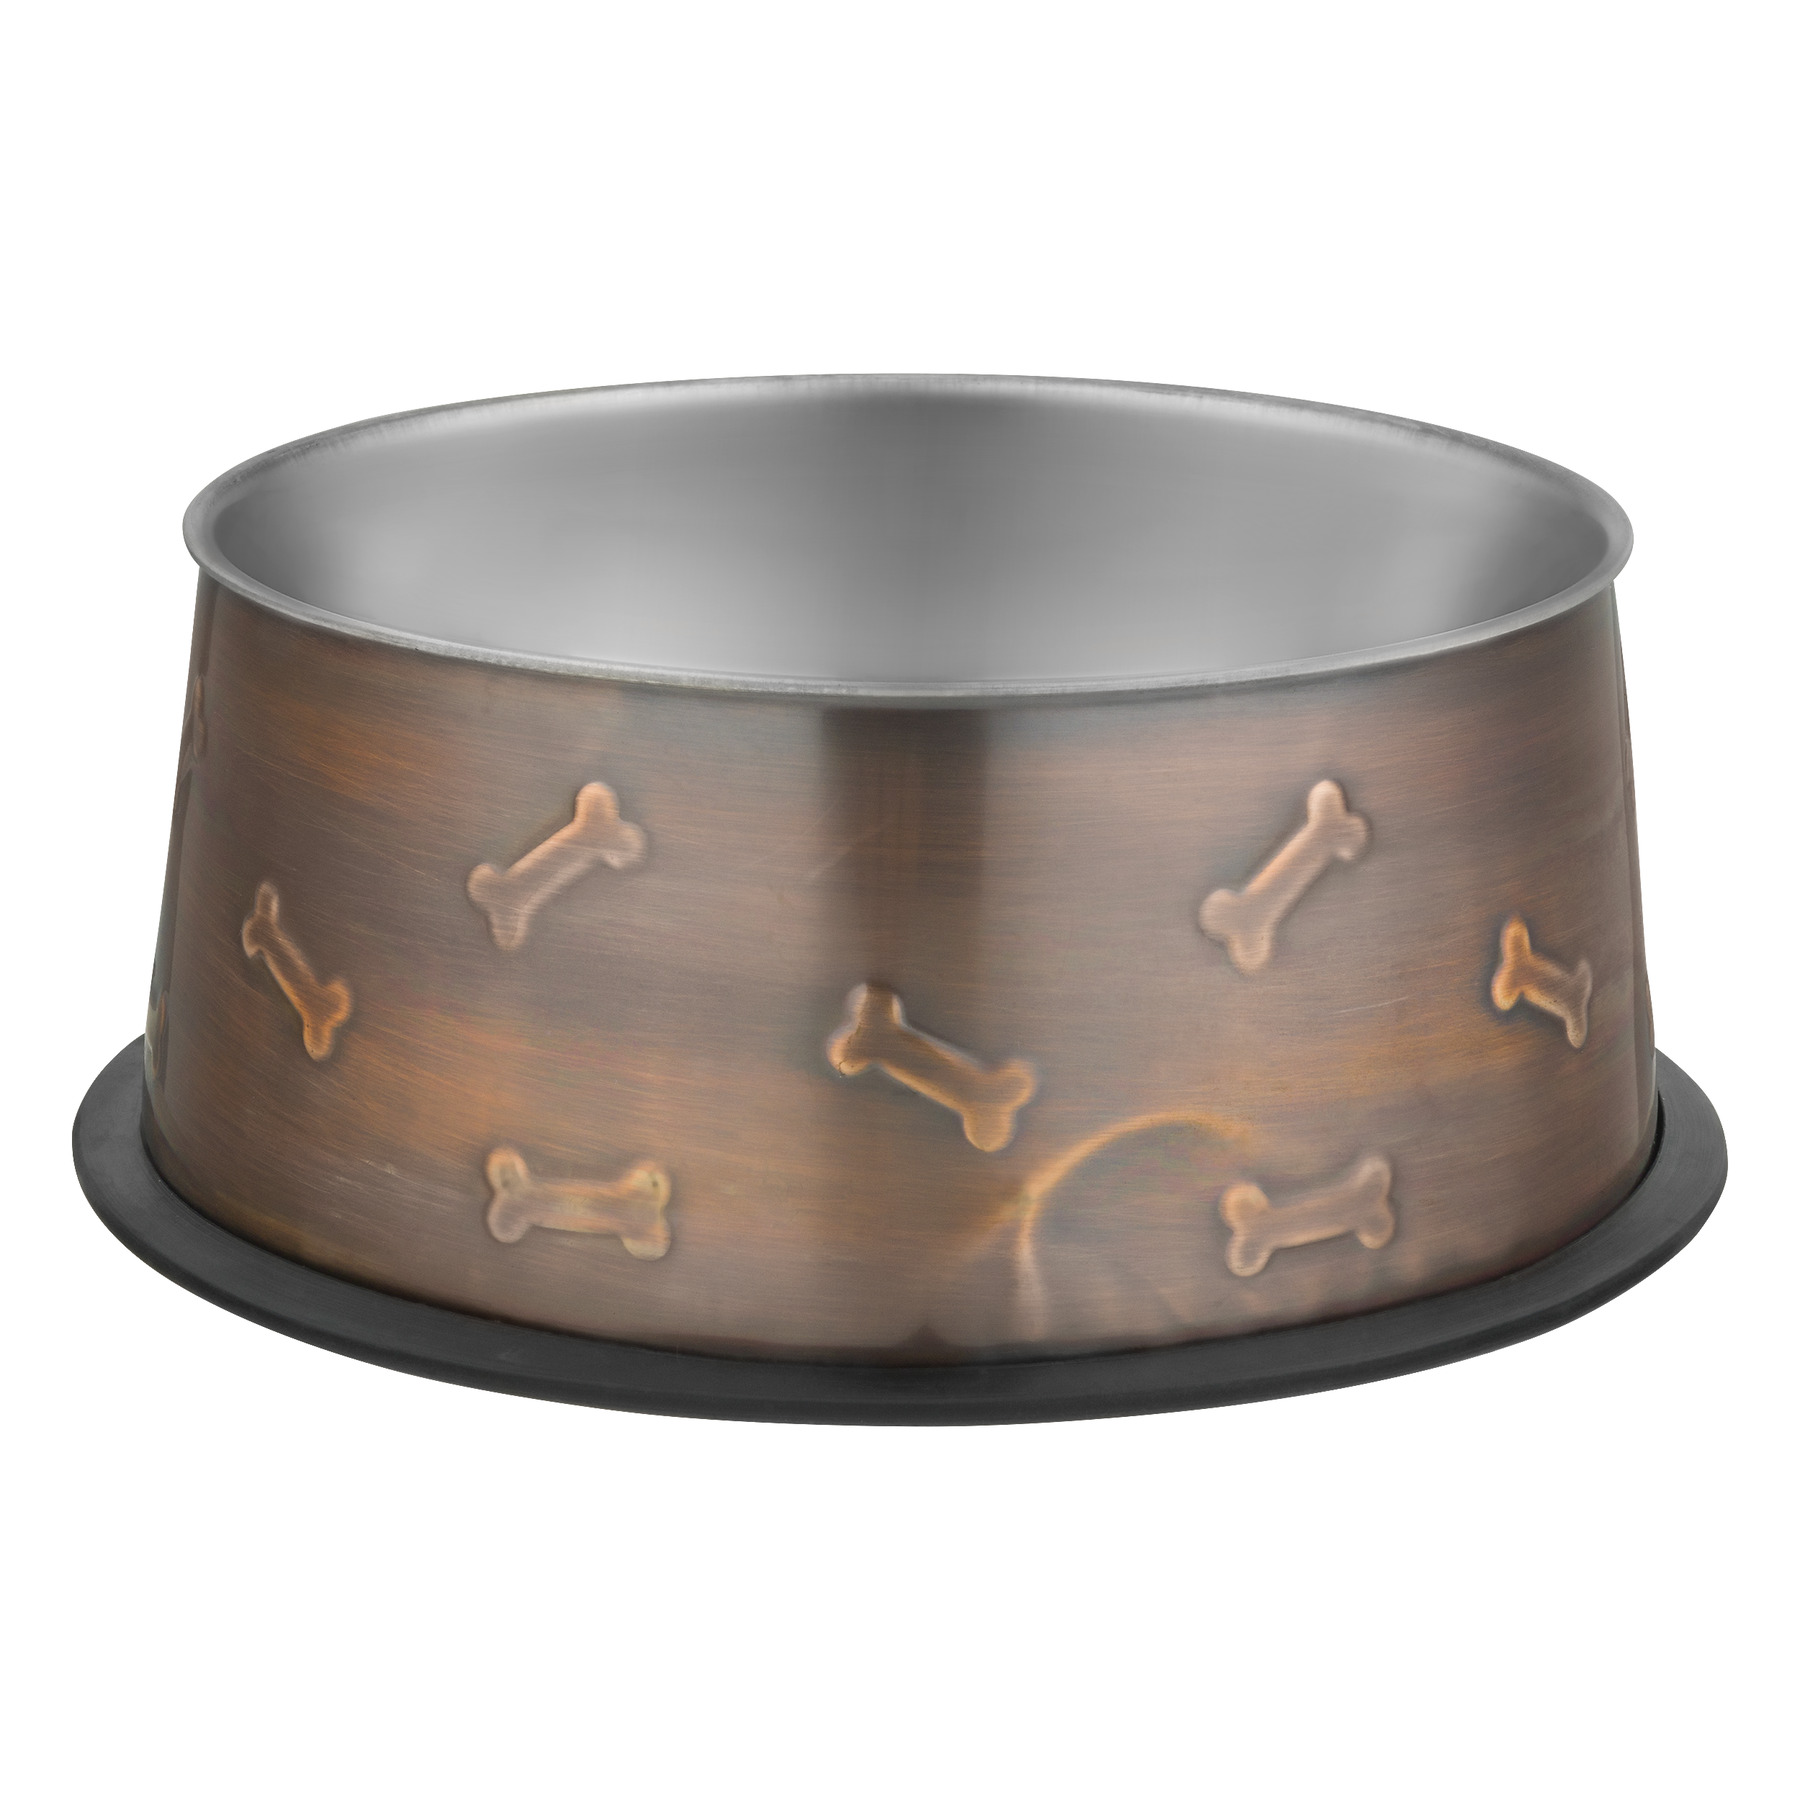 Loving Pets Ruff-N-Tuff Bowl Artistic Antique Copper 48OZ, 1.0 CT